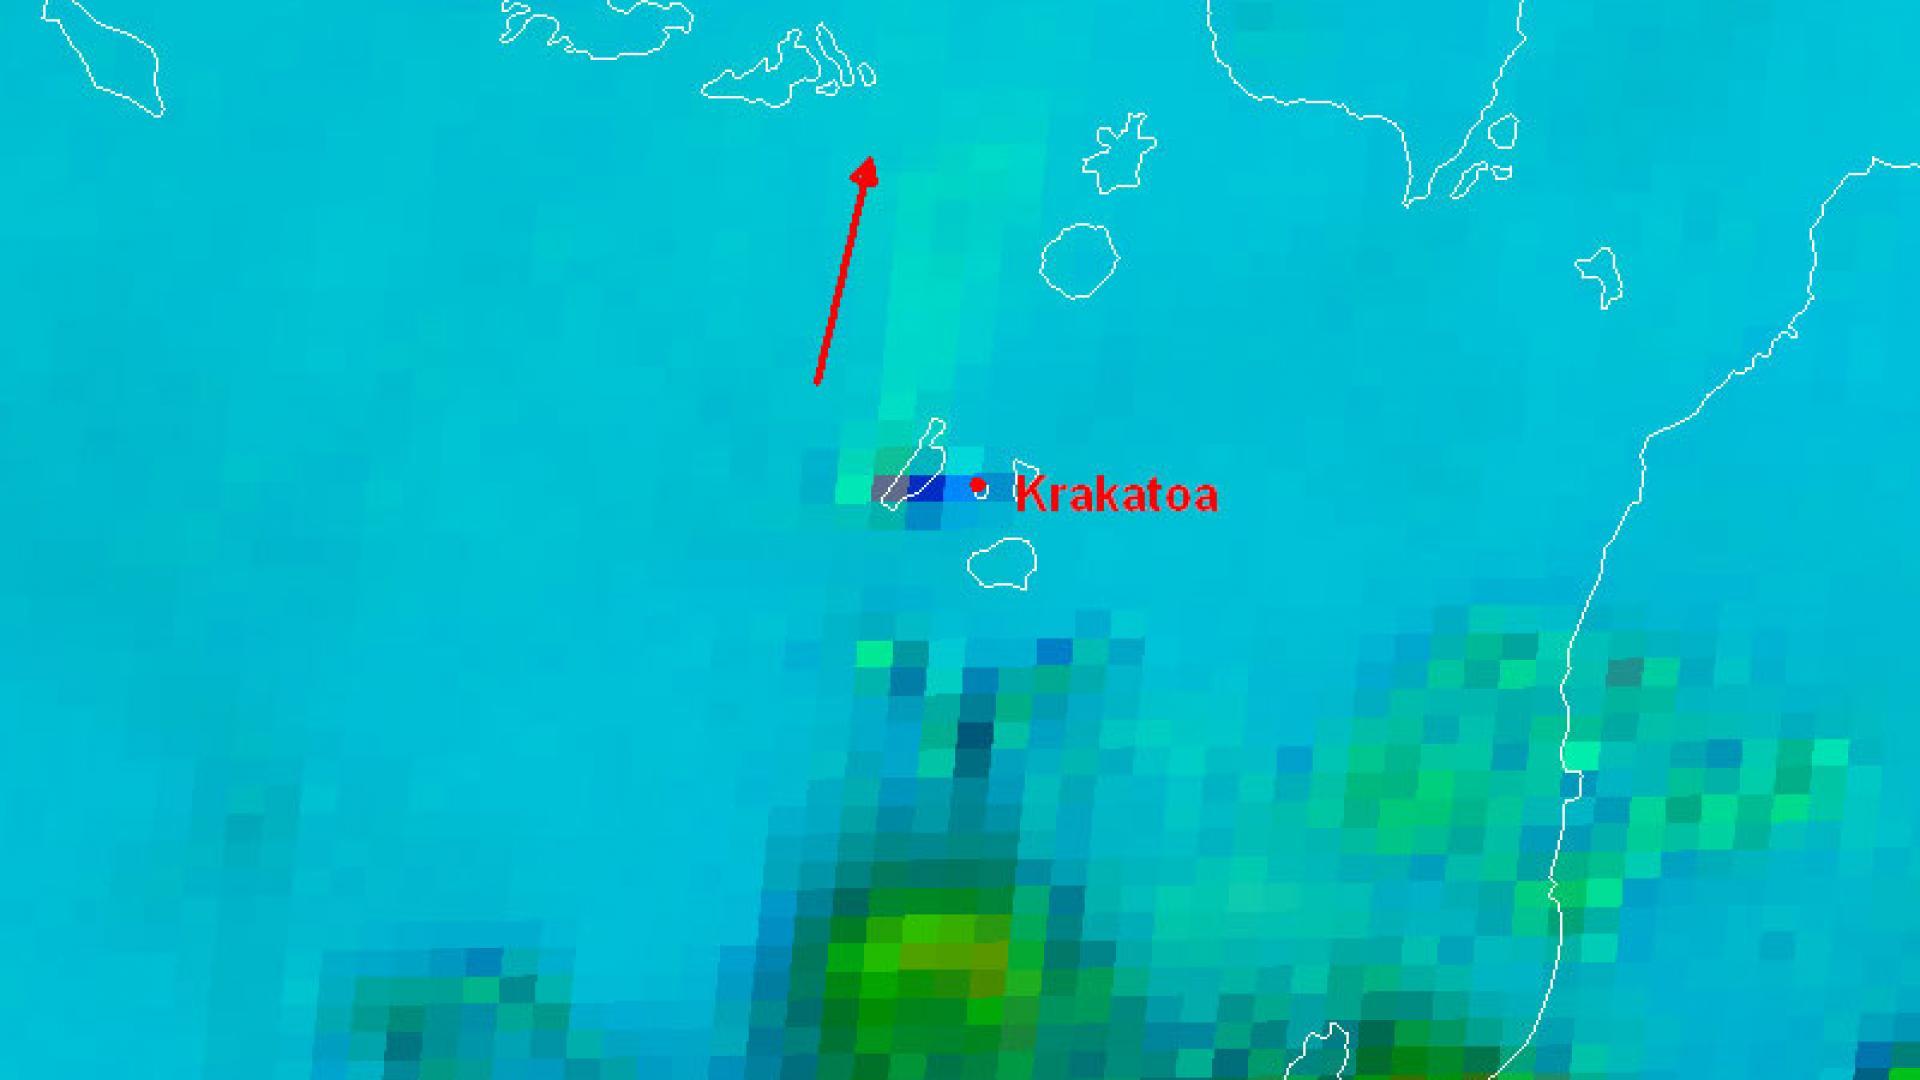 Eruption of Krakatoa viewed under clear skies